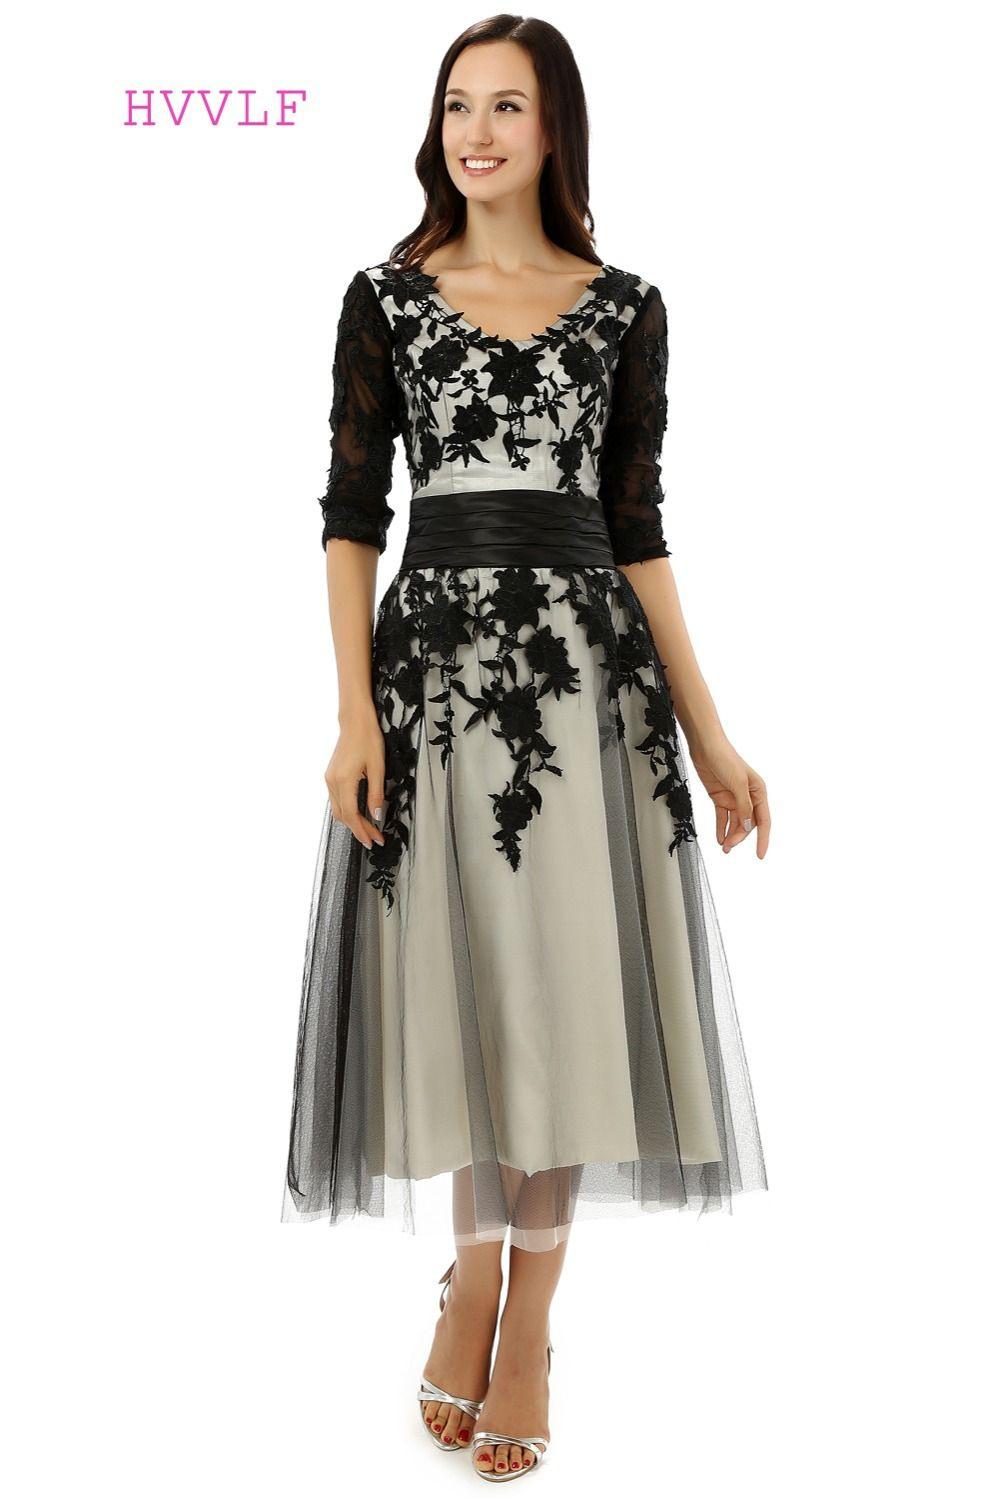 20 Luxus Halblange Abendkleider Boutique Elegant Halblange Abendkleider Vertrieb